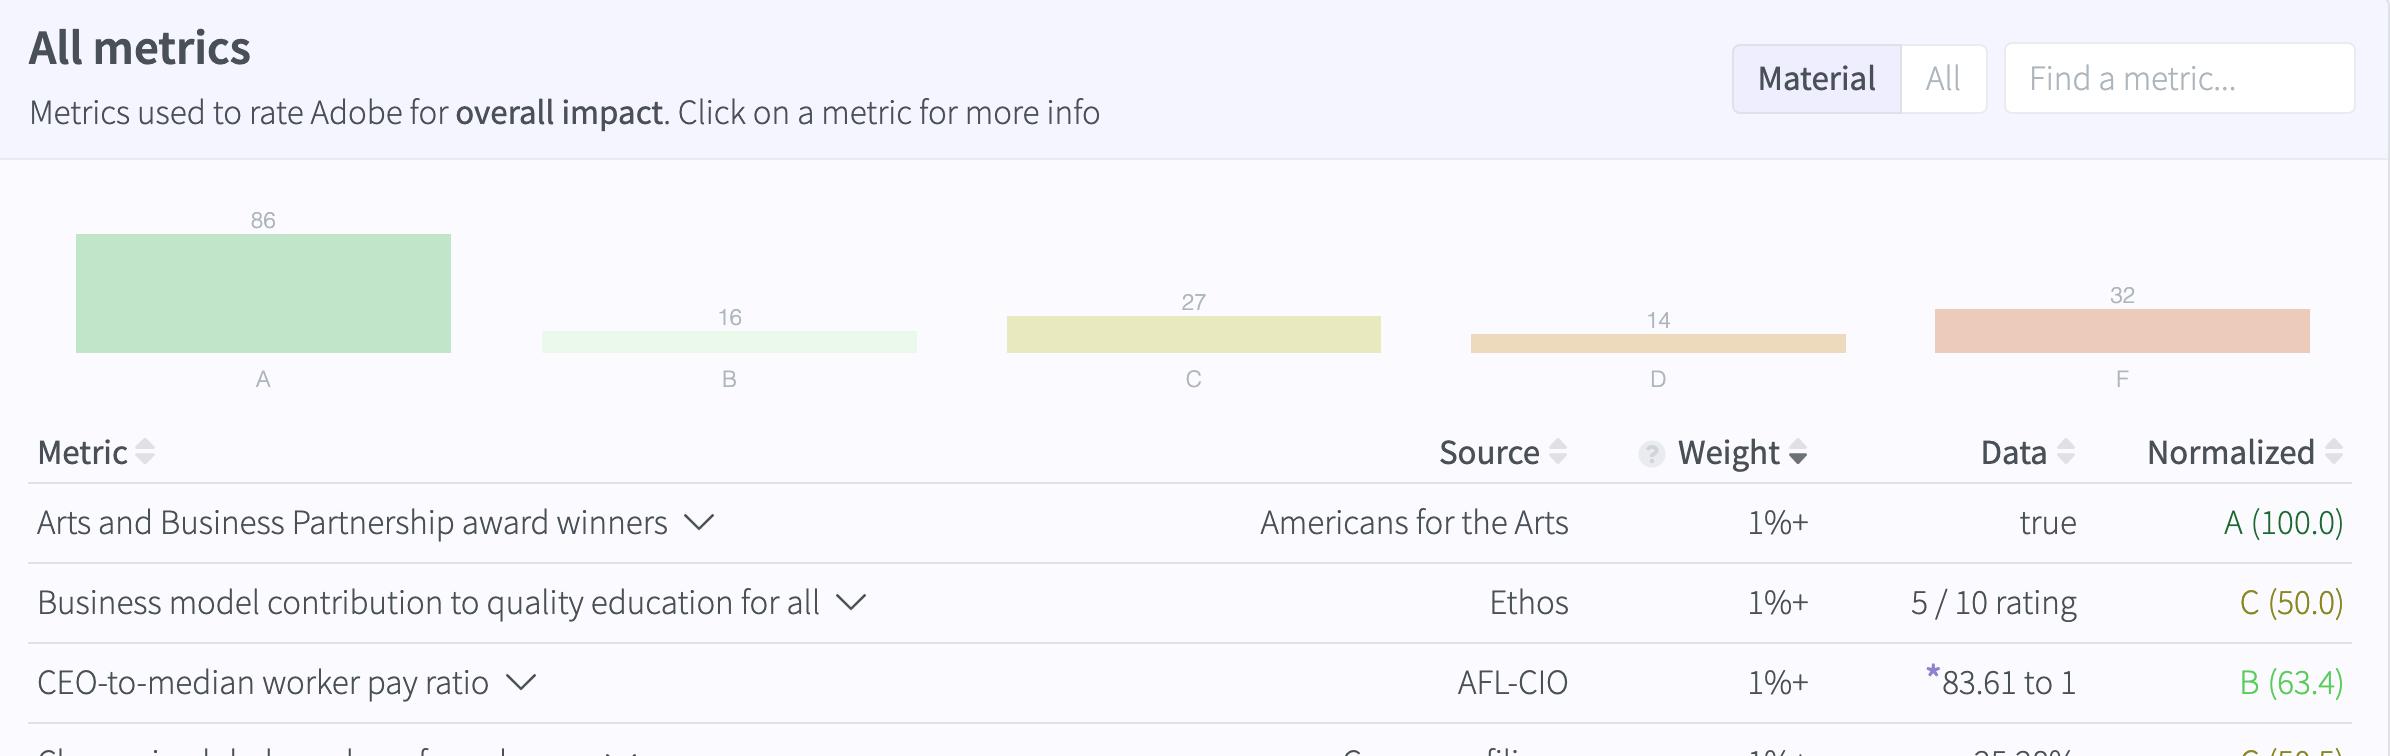 All metrics